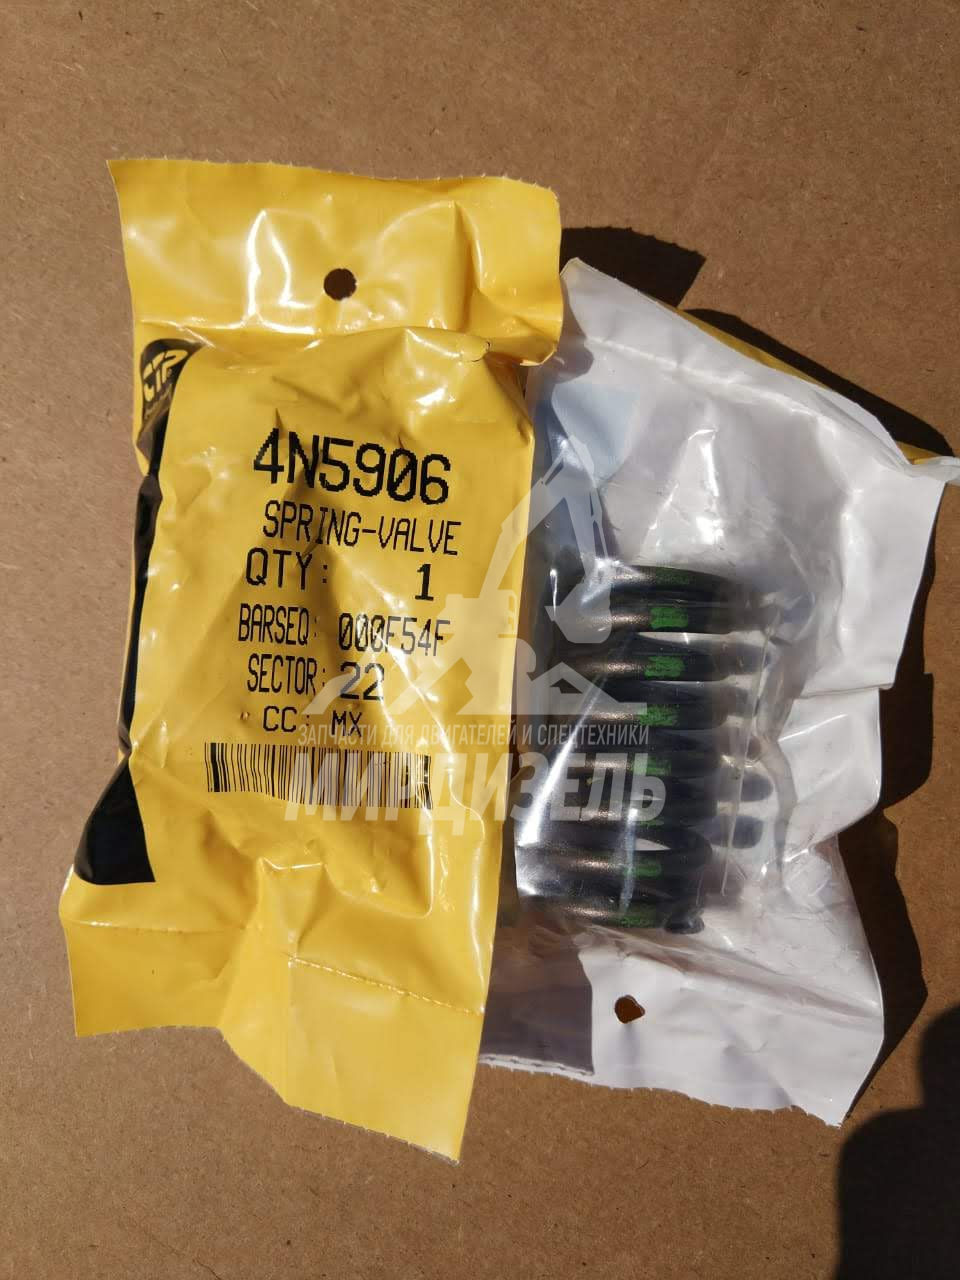 Пружина клапана 4N-5906(4N5906) для Caterpillar (Катерпиллер)